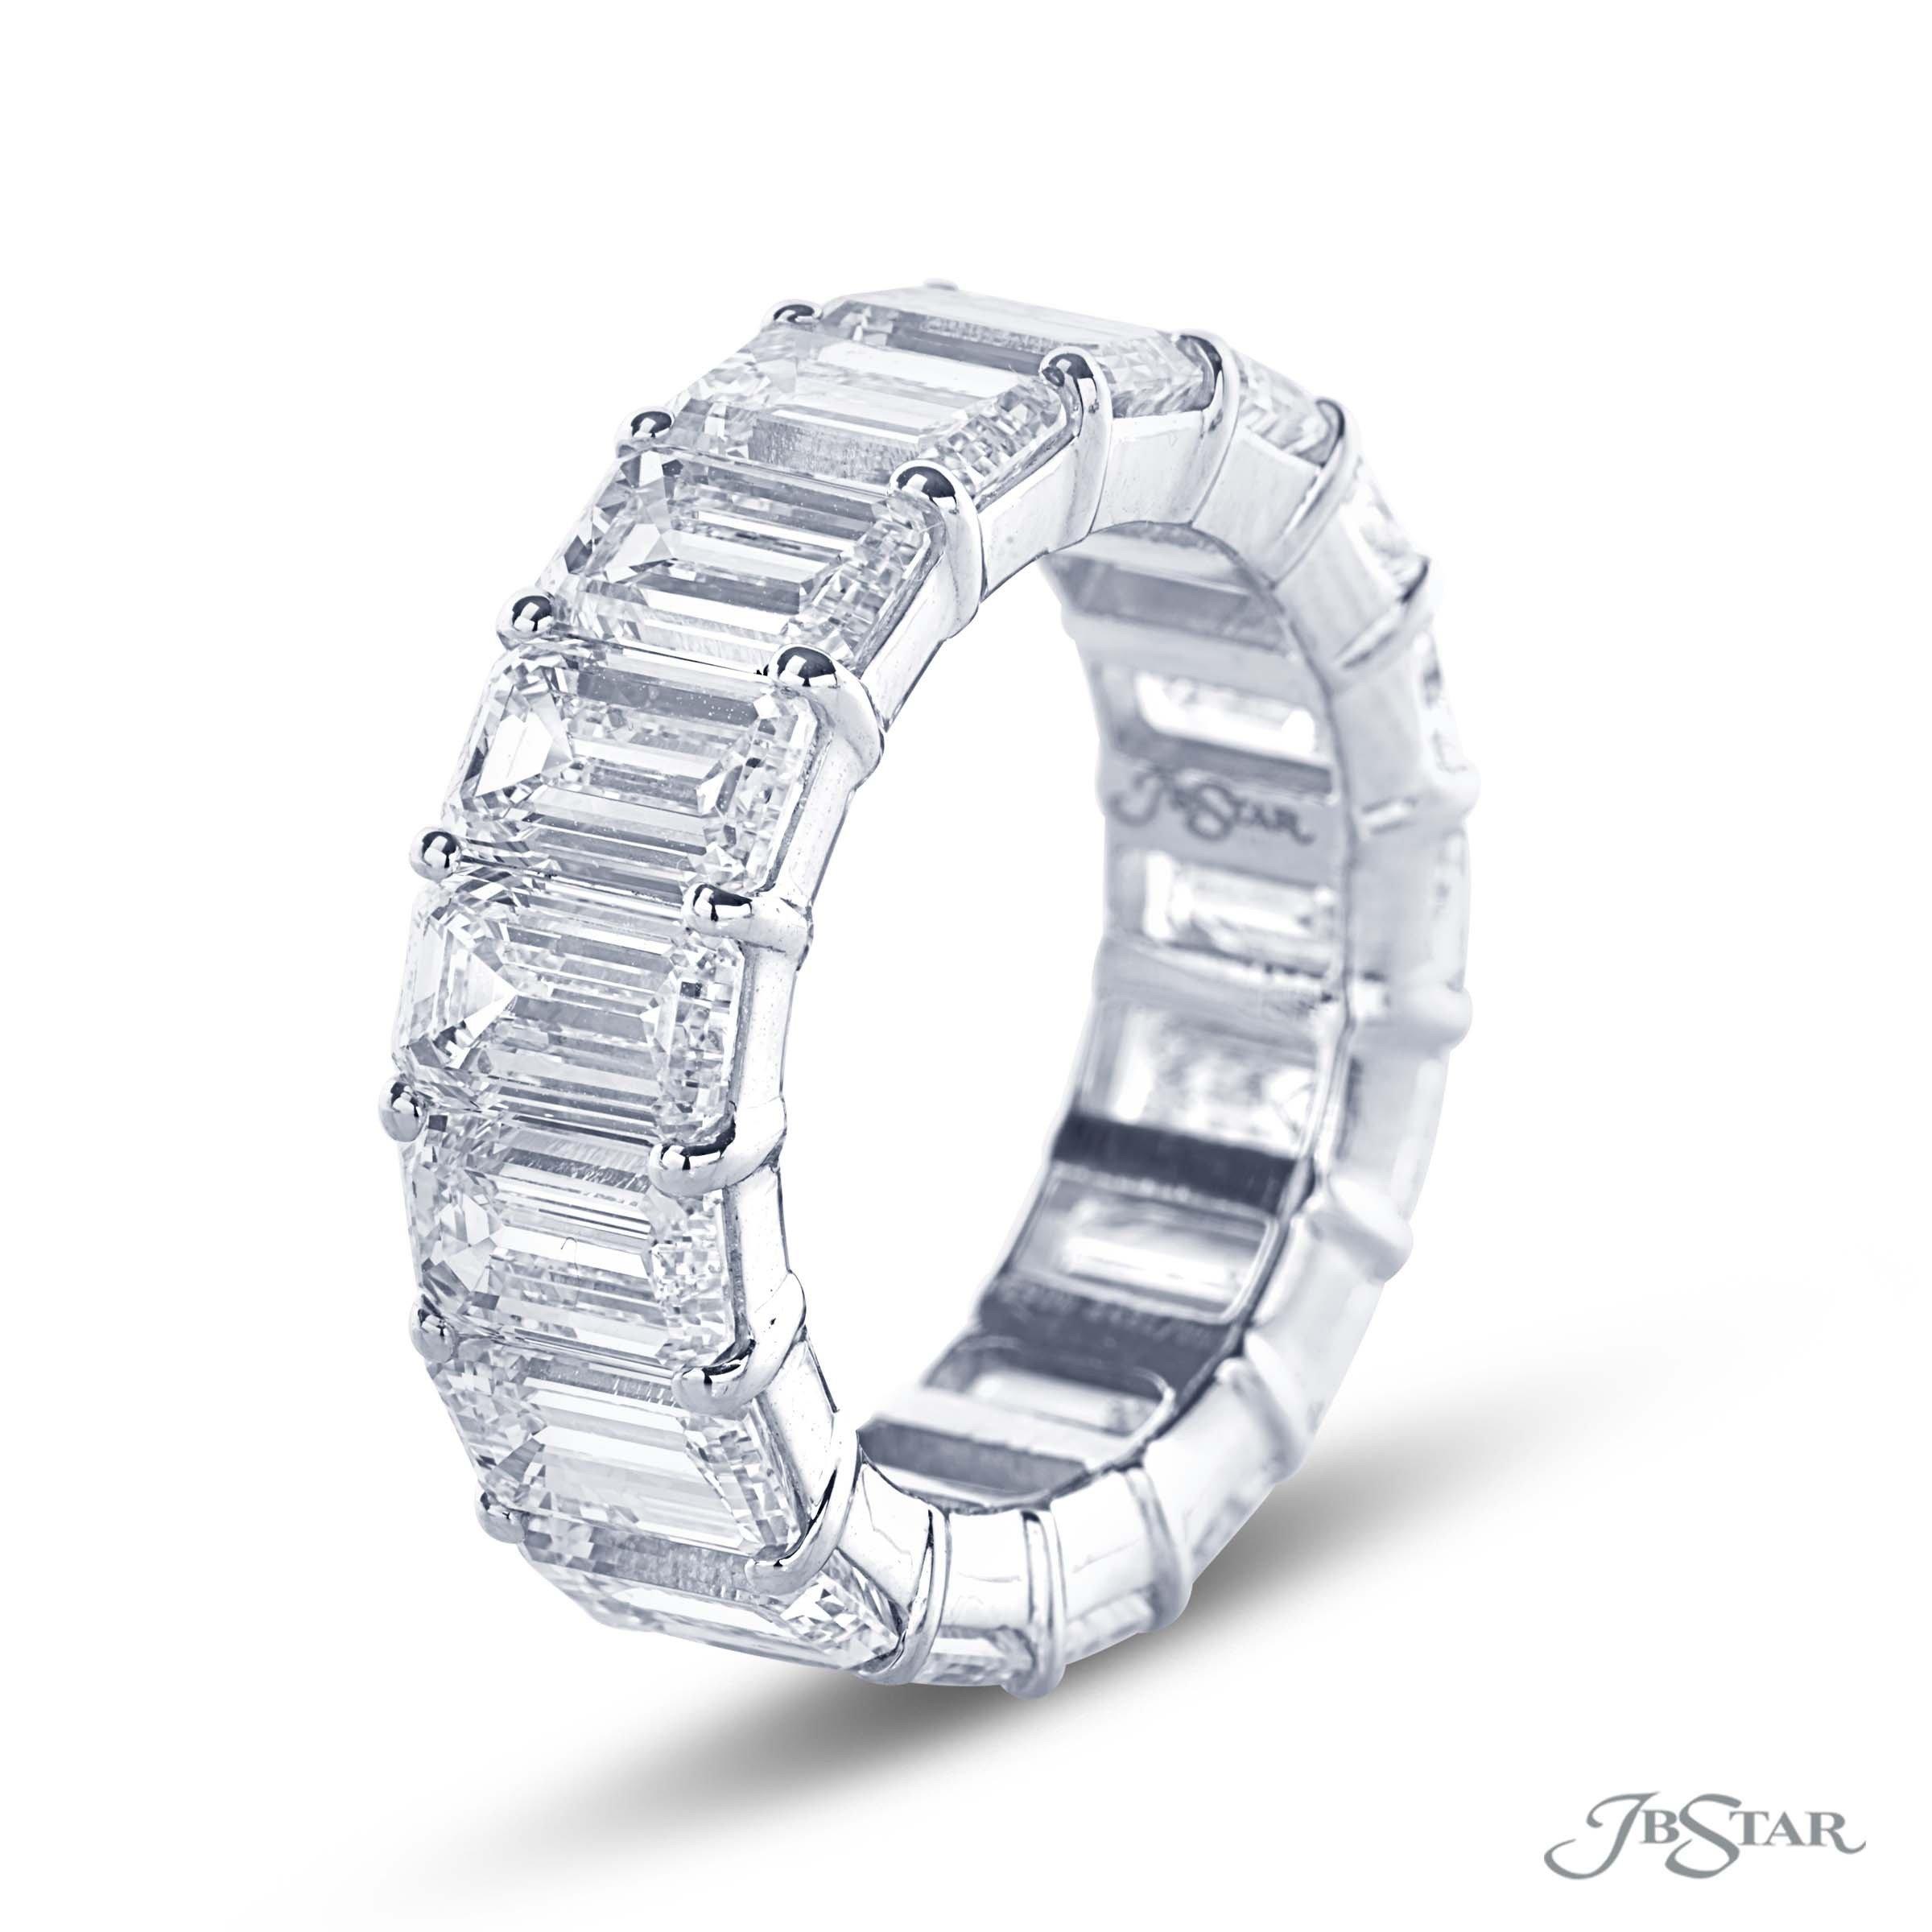 JB Star Emerald Eternity Ring 11.66 cts Diamonds - alternate